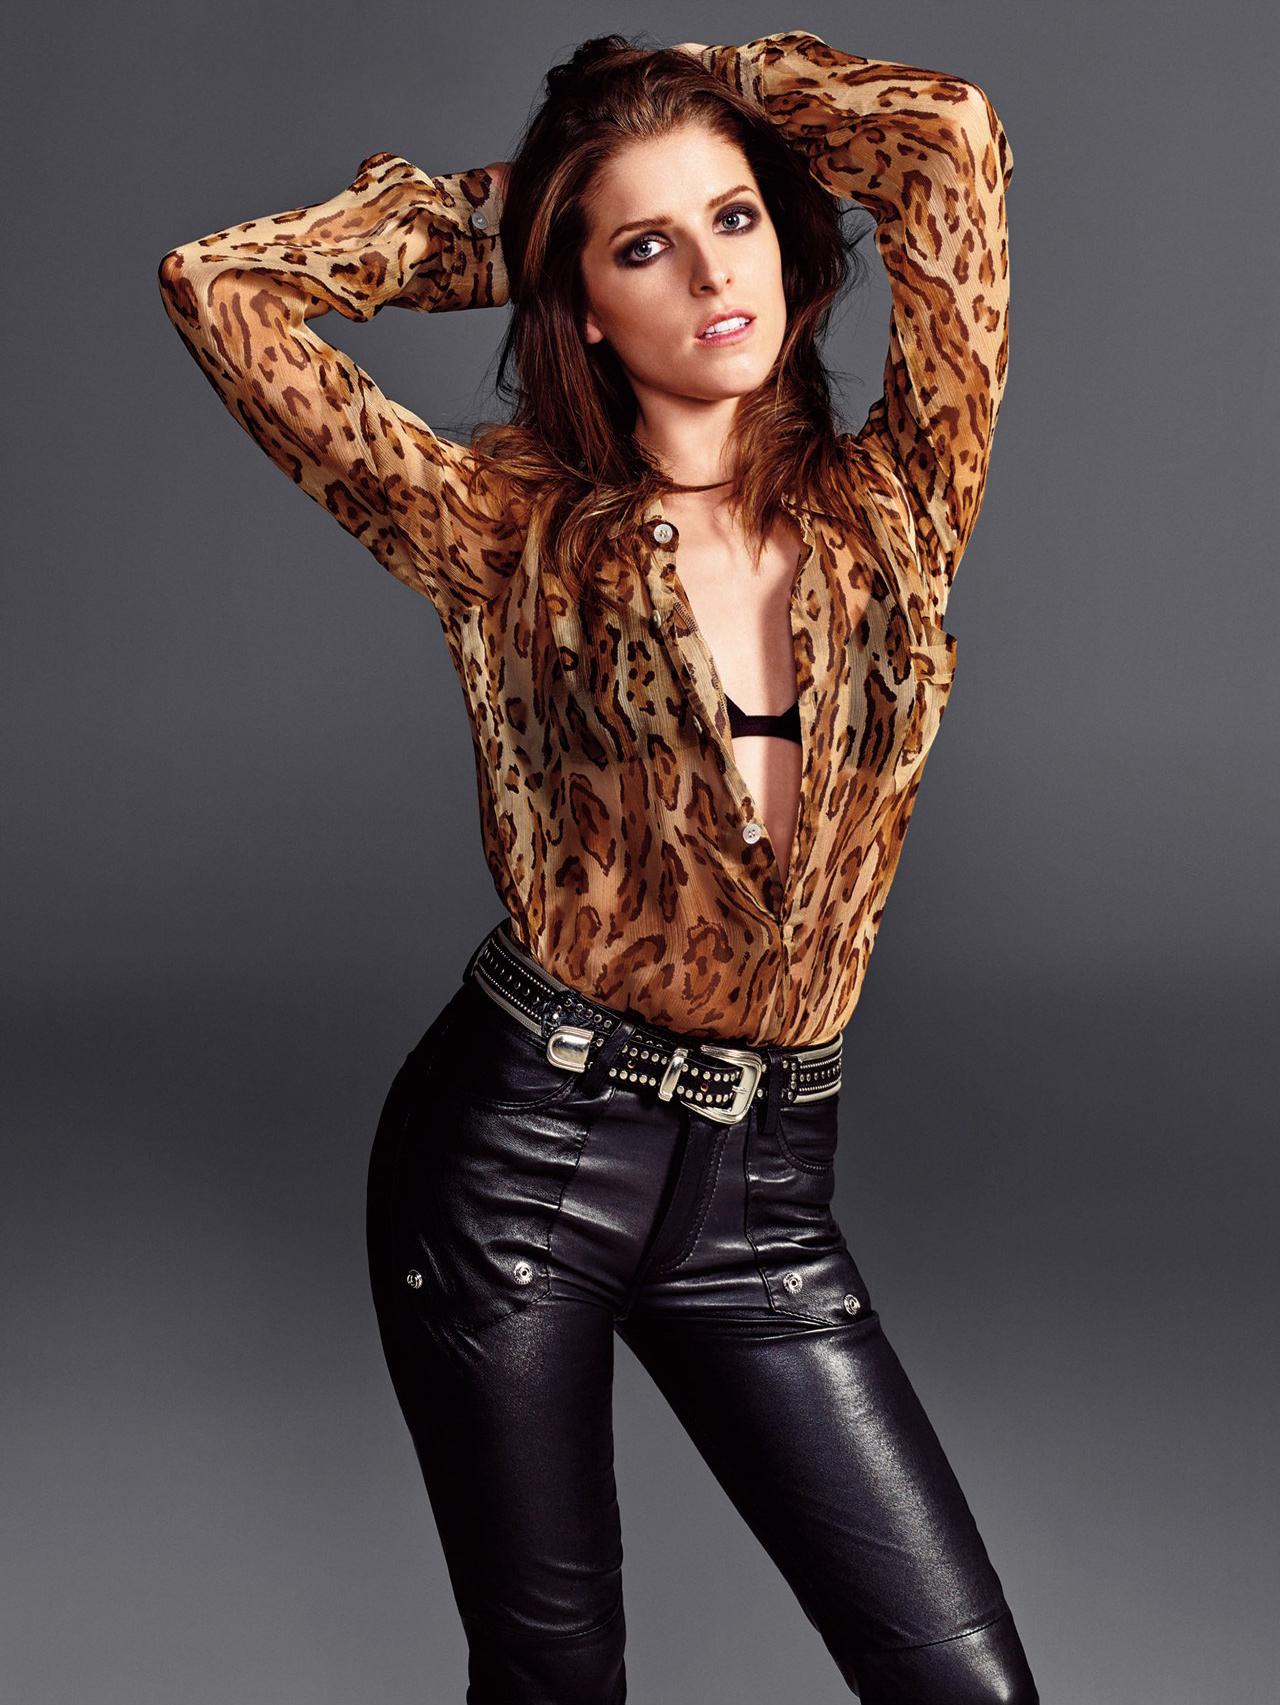 akvn.net-Anna-Kendrick-Glamour-UK-Magazine-Photoshoot-2015-01 (1).jpg